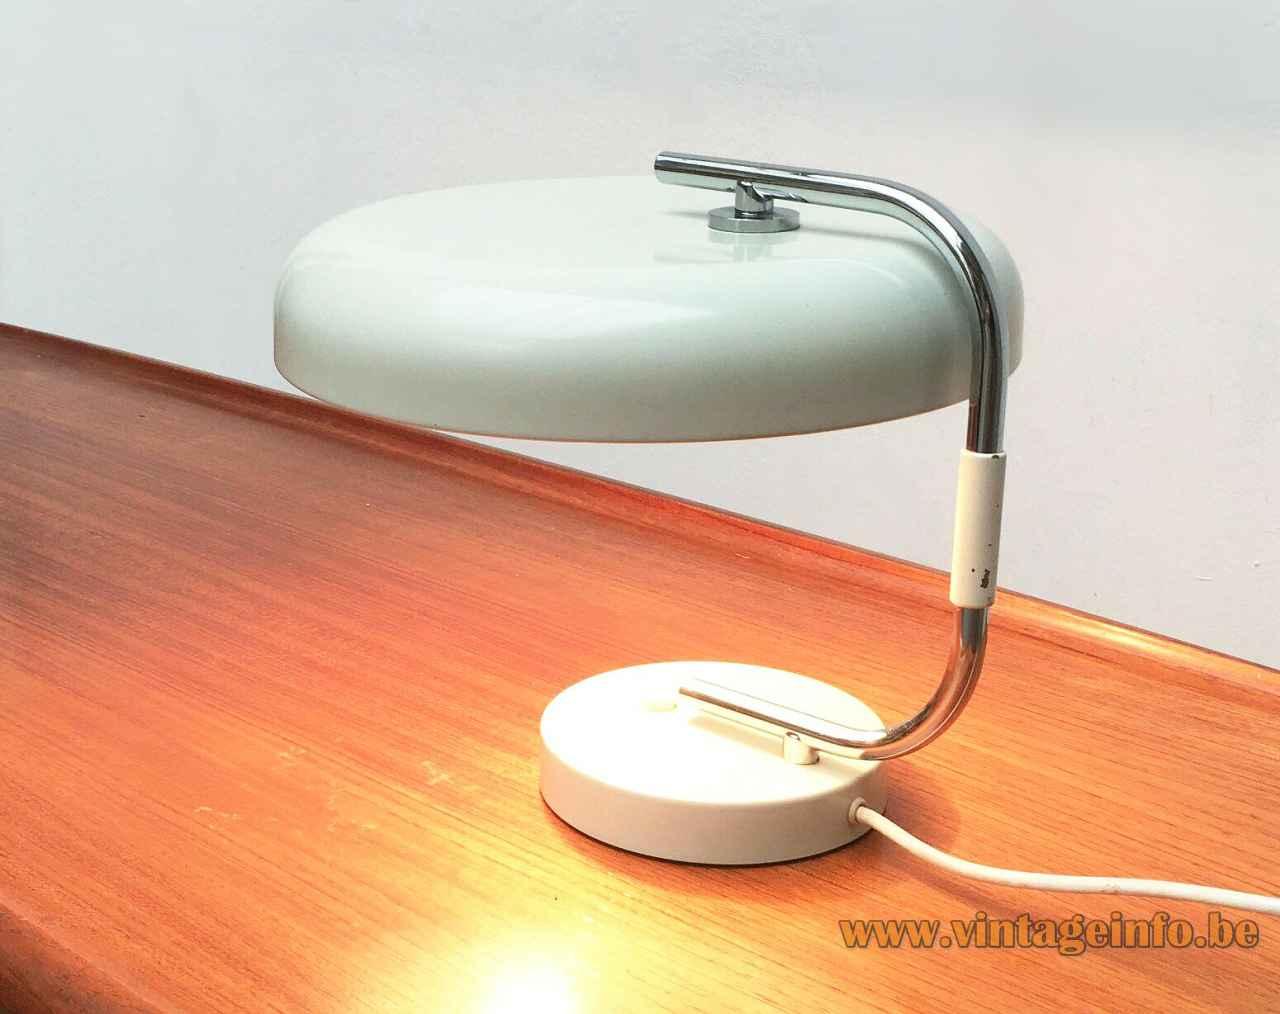 1960s Hustadt-Leuchten desk lamp round white metal base curved chrome rod aluminium mushroom lampshade 1970s Germany